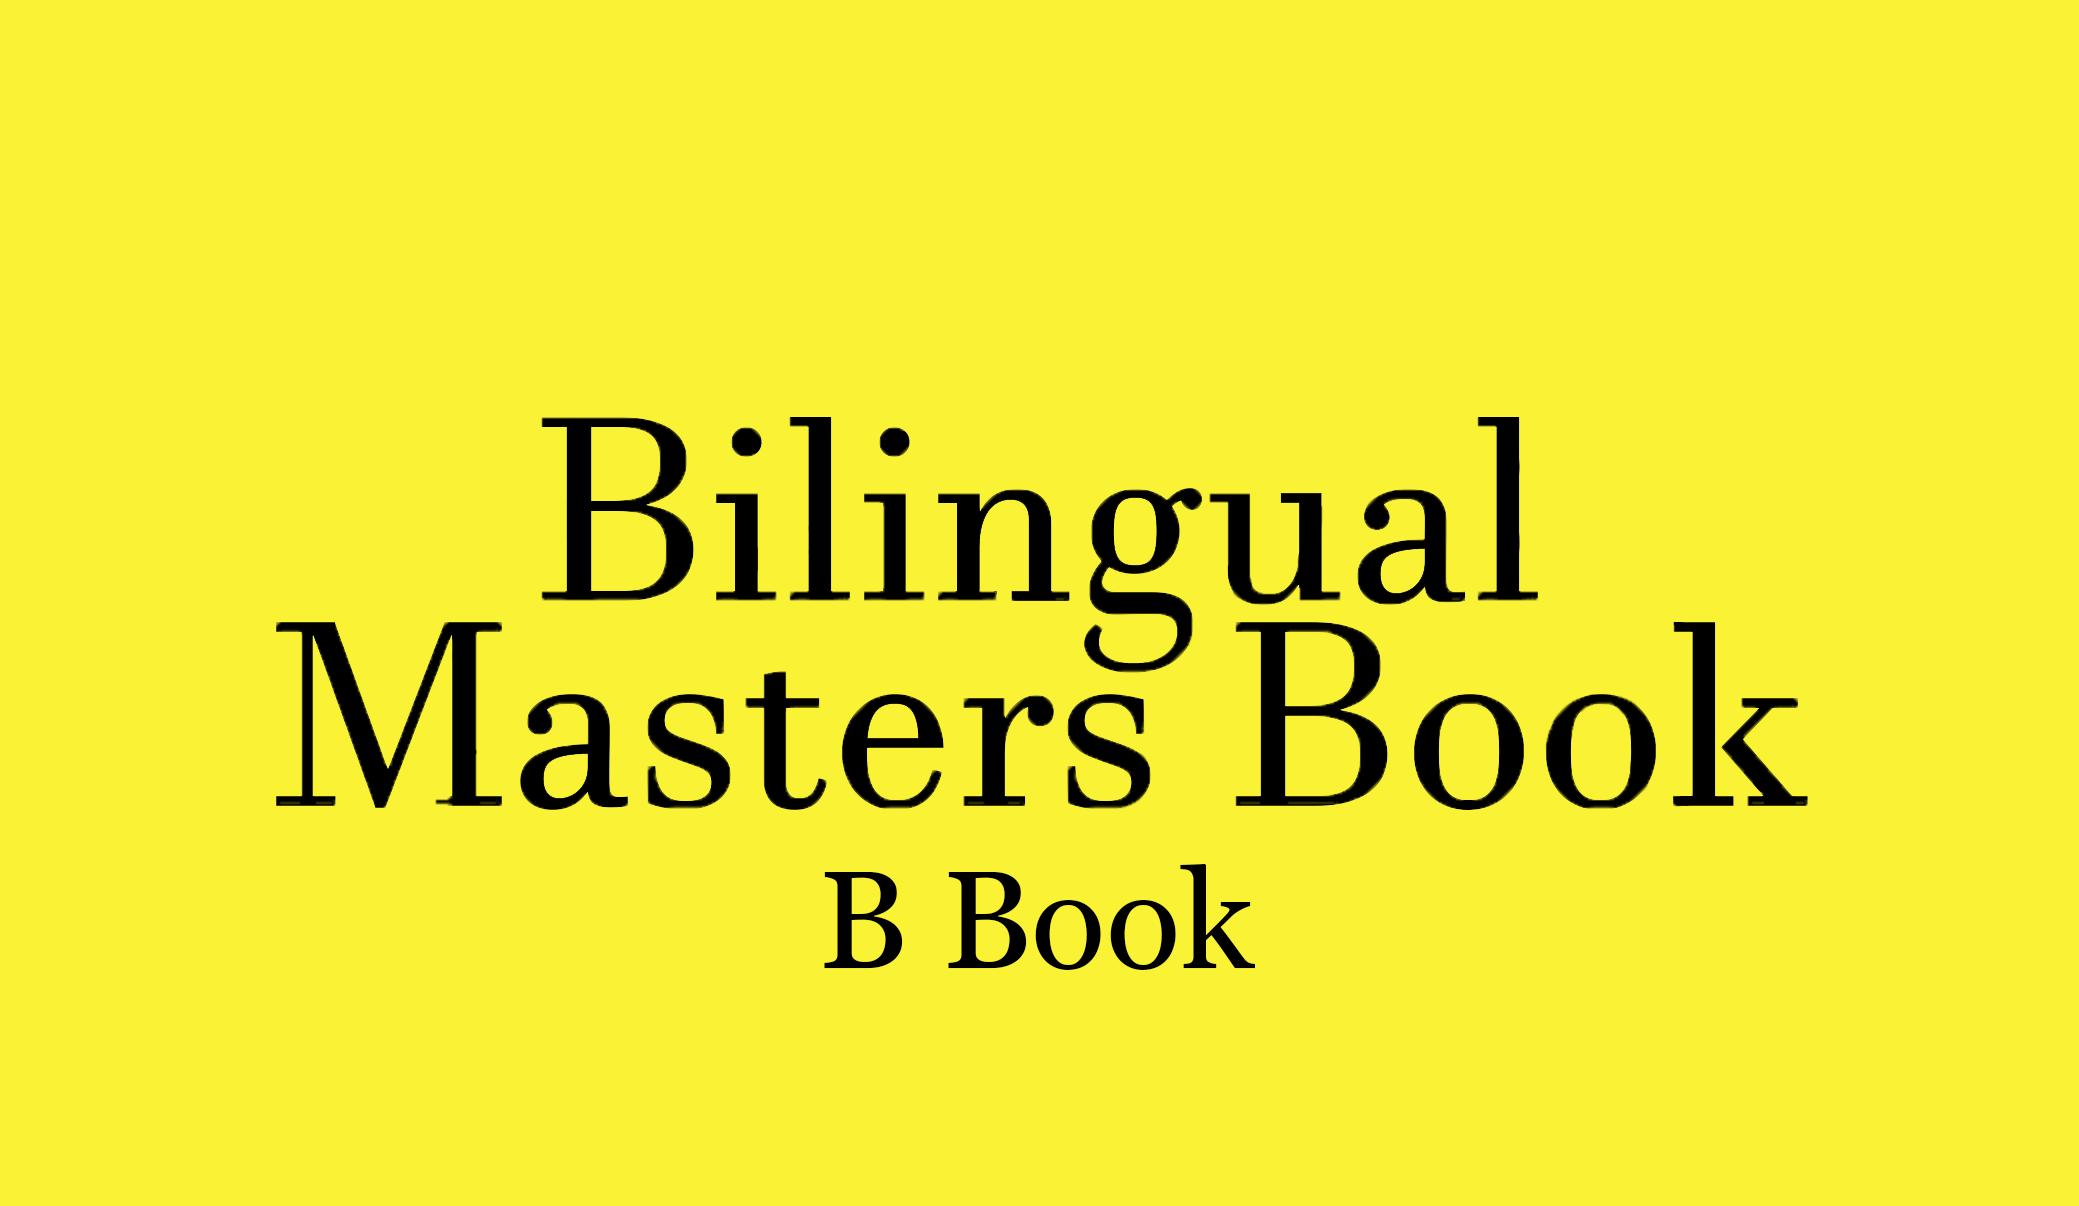 b book.png